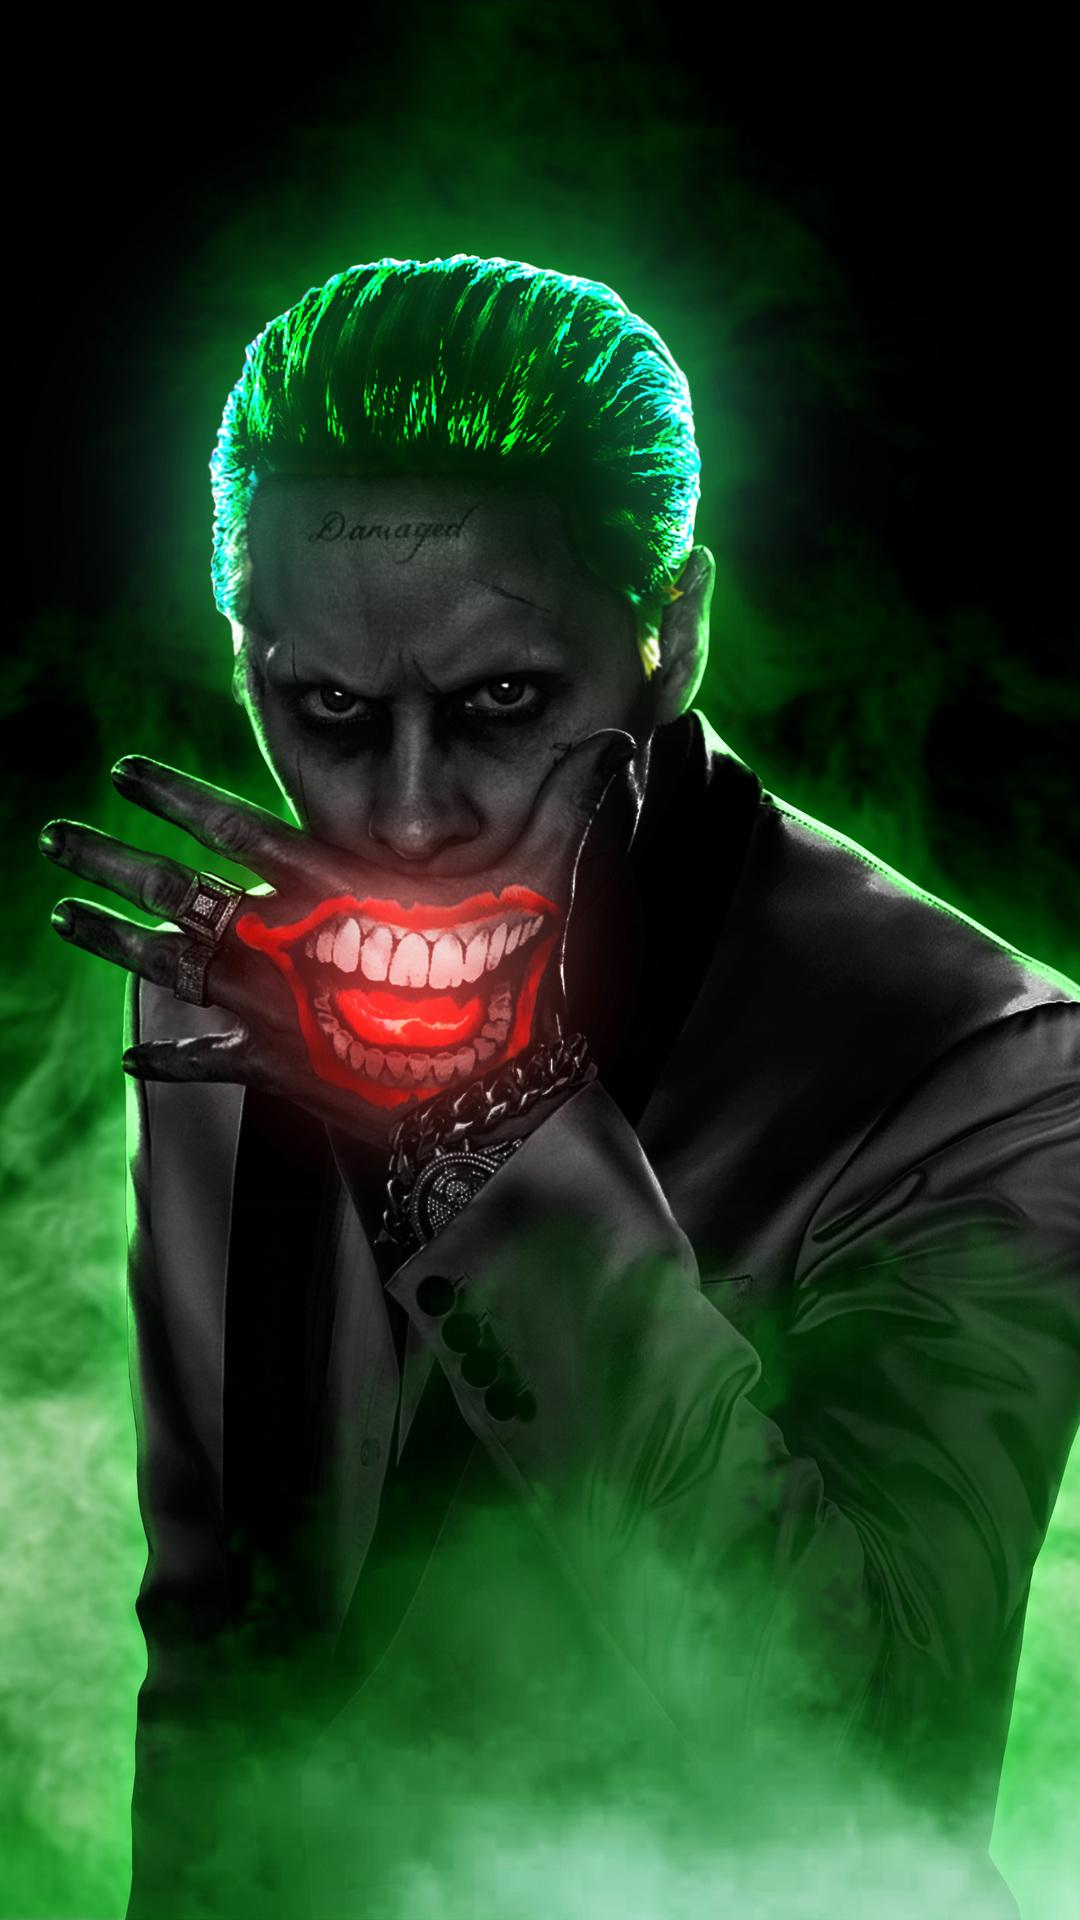 1080x1920 Jared Leto Joker 4k Iphone 7,6s,6 Plus, Pixel xl ...